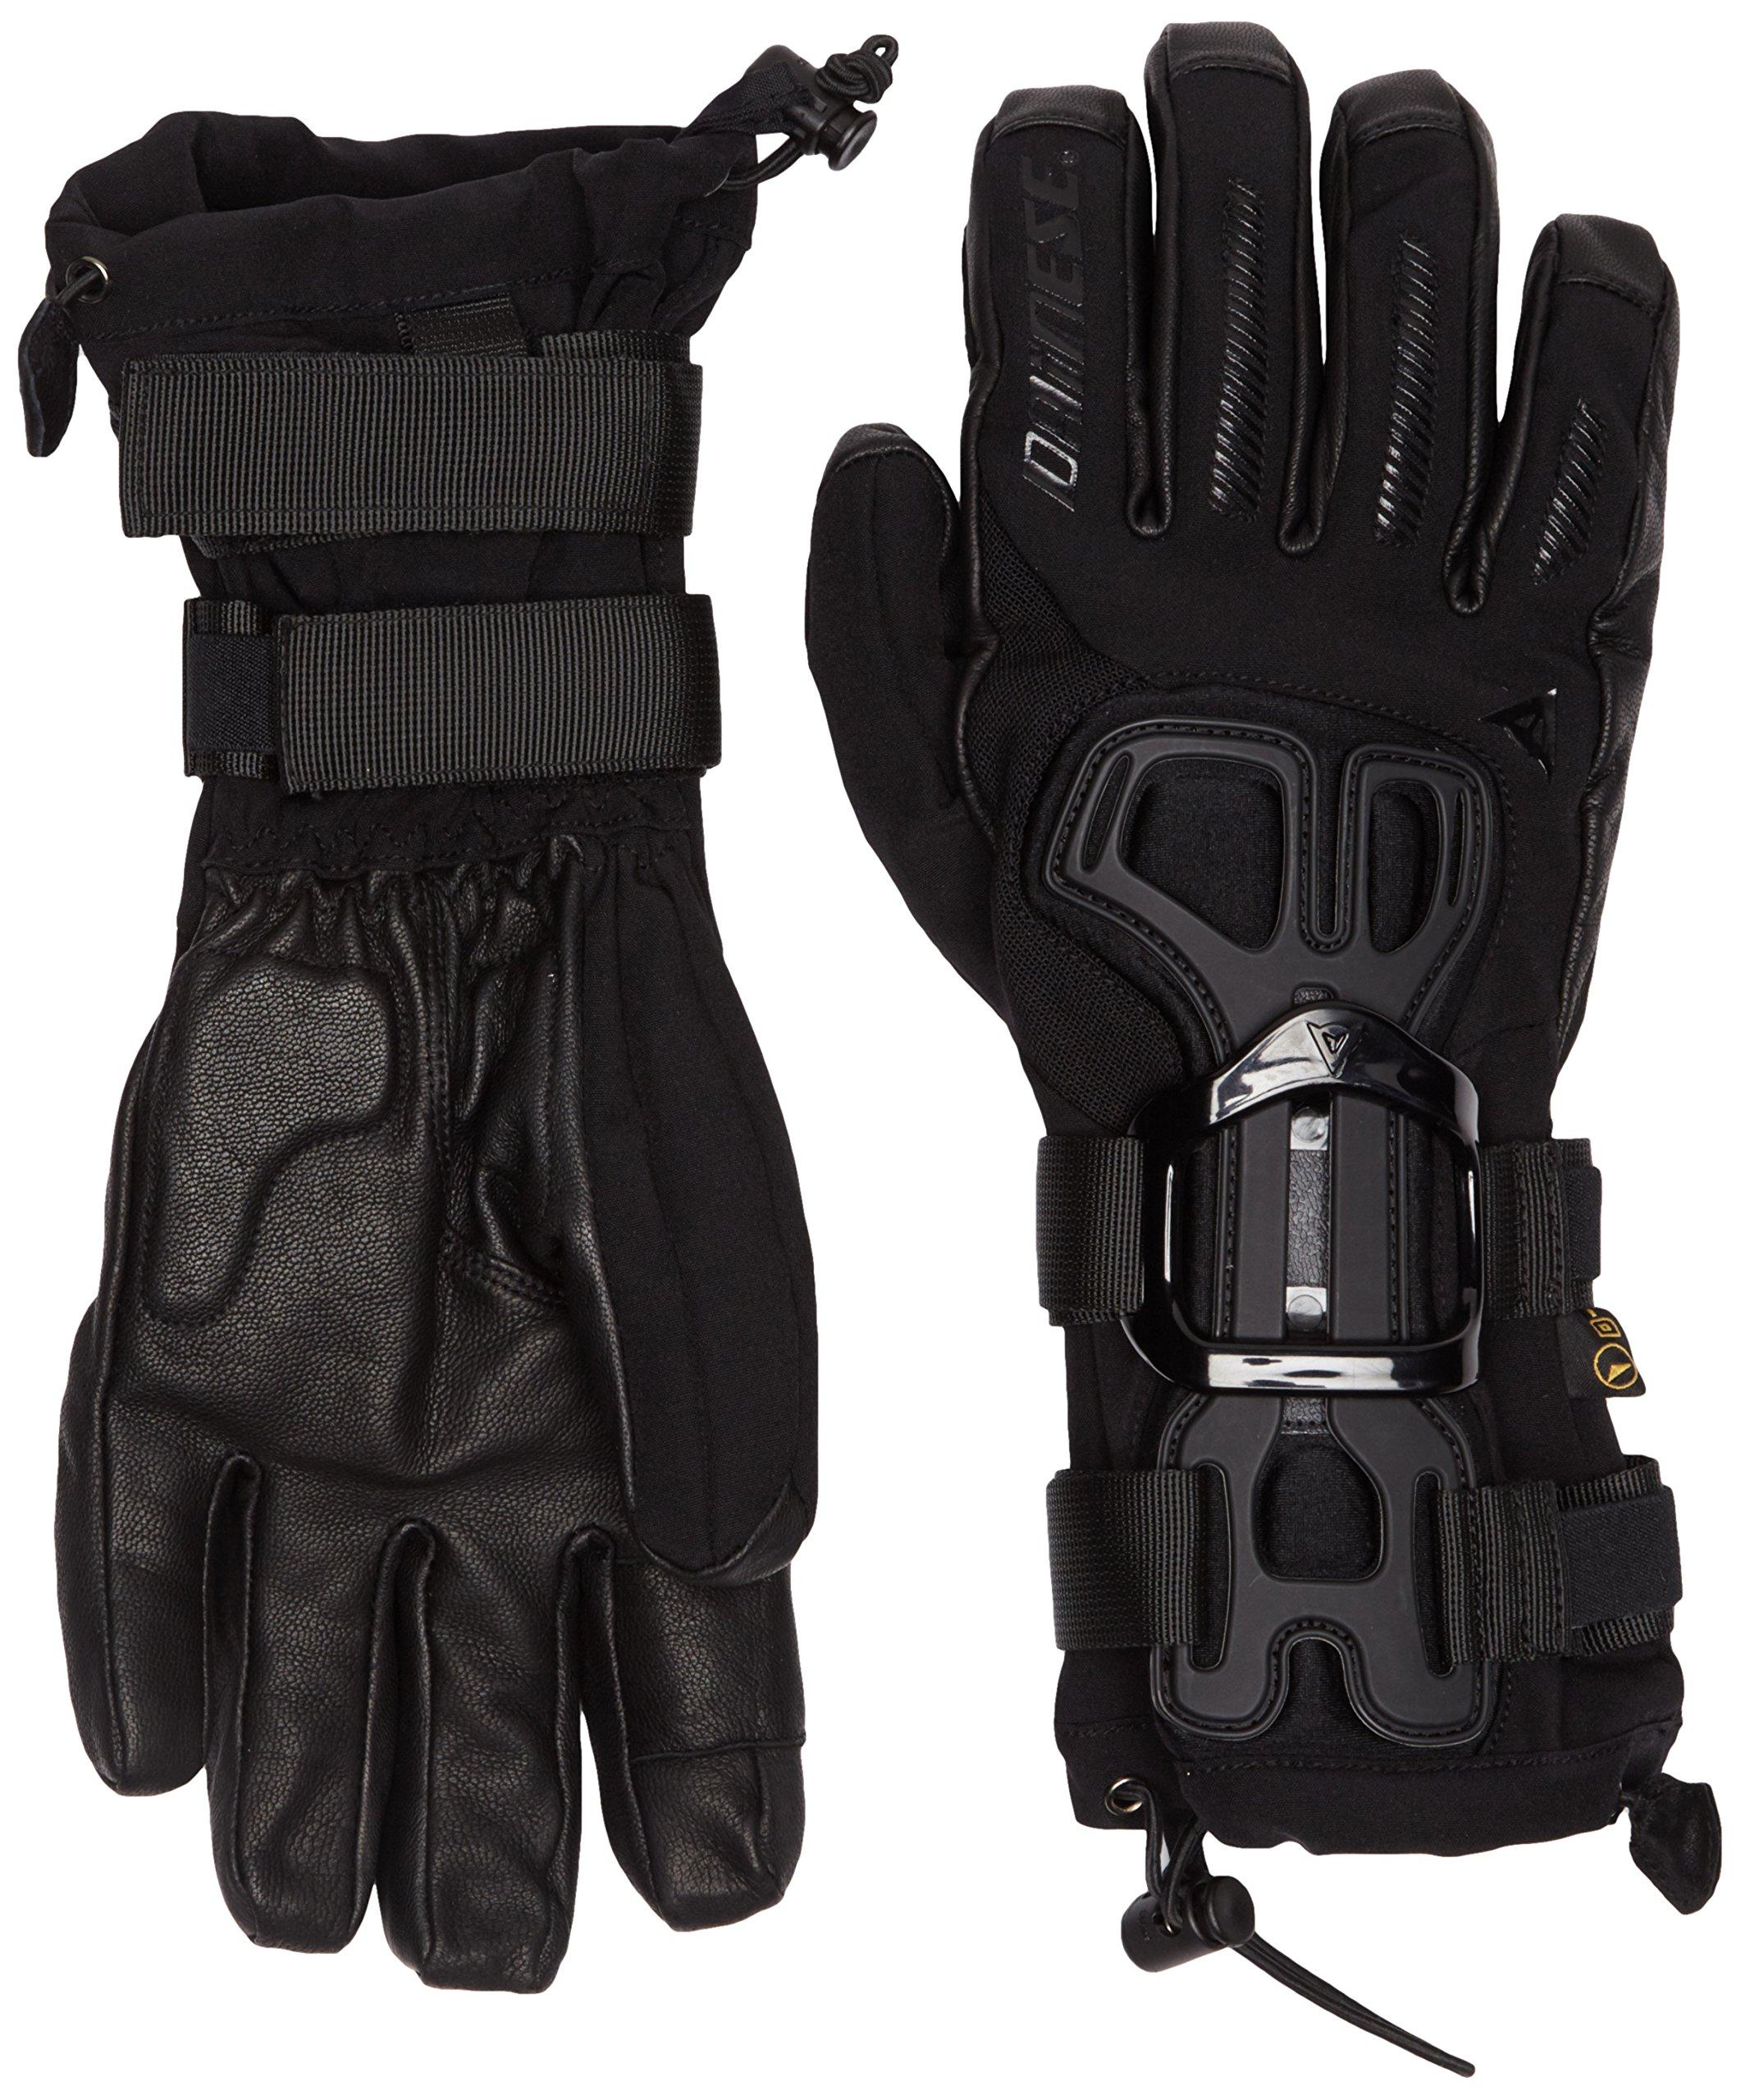 Dainese Erwachsene Skiprotektor D-Impact 13 D-Dry Gloves Snowboard Handschuhe mi